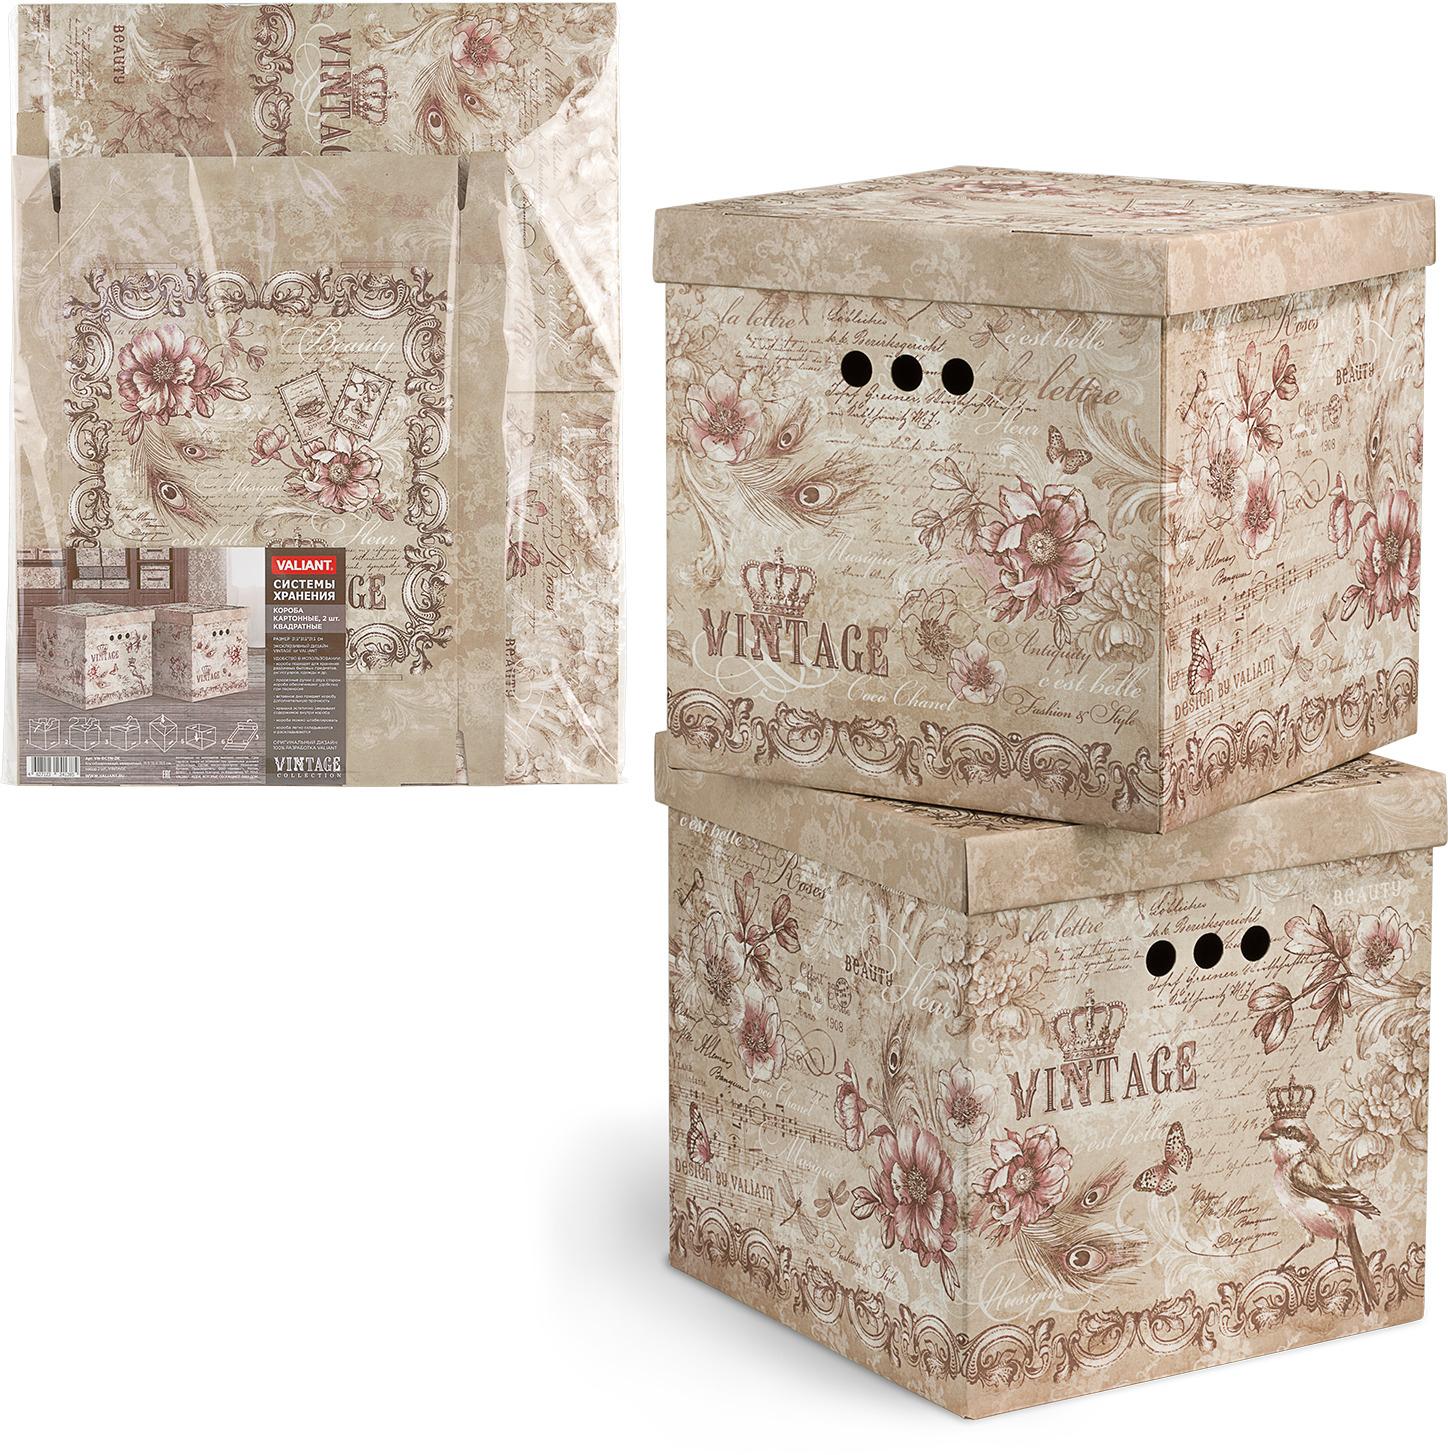 Короб картонный Valiant Vintage, складной, 31.5 х 31.5 х 31.5 см, 2 шт набор сундучков roura decoracion 26 х 20 х 15 см 2 шт 34791